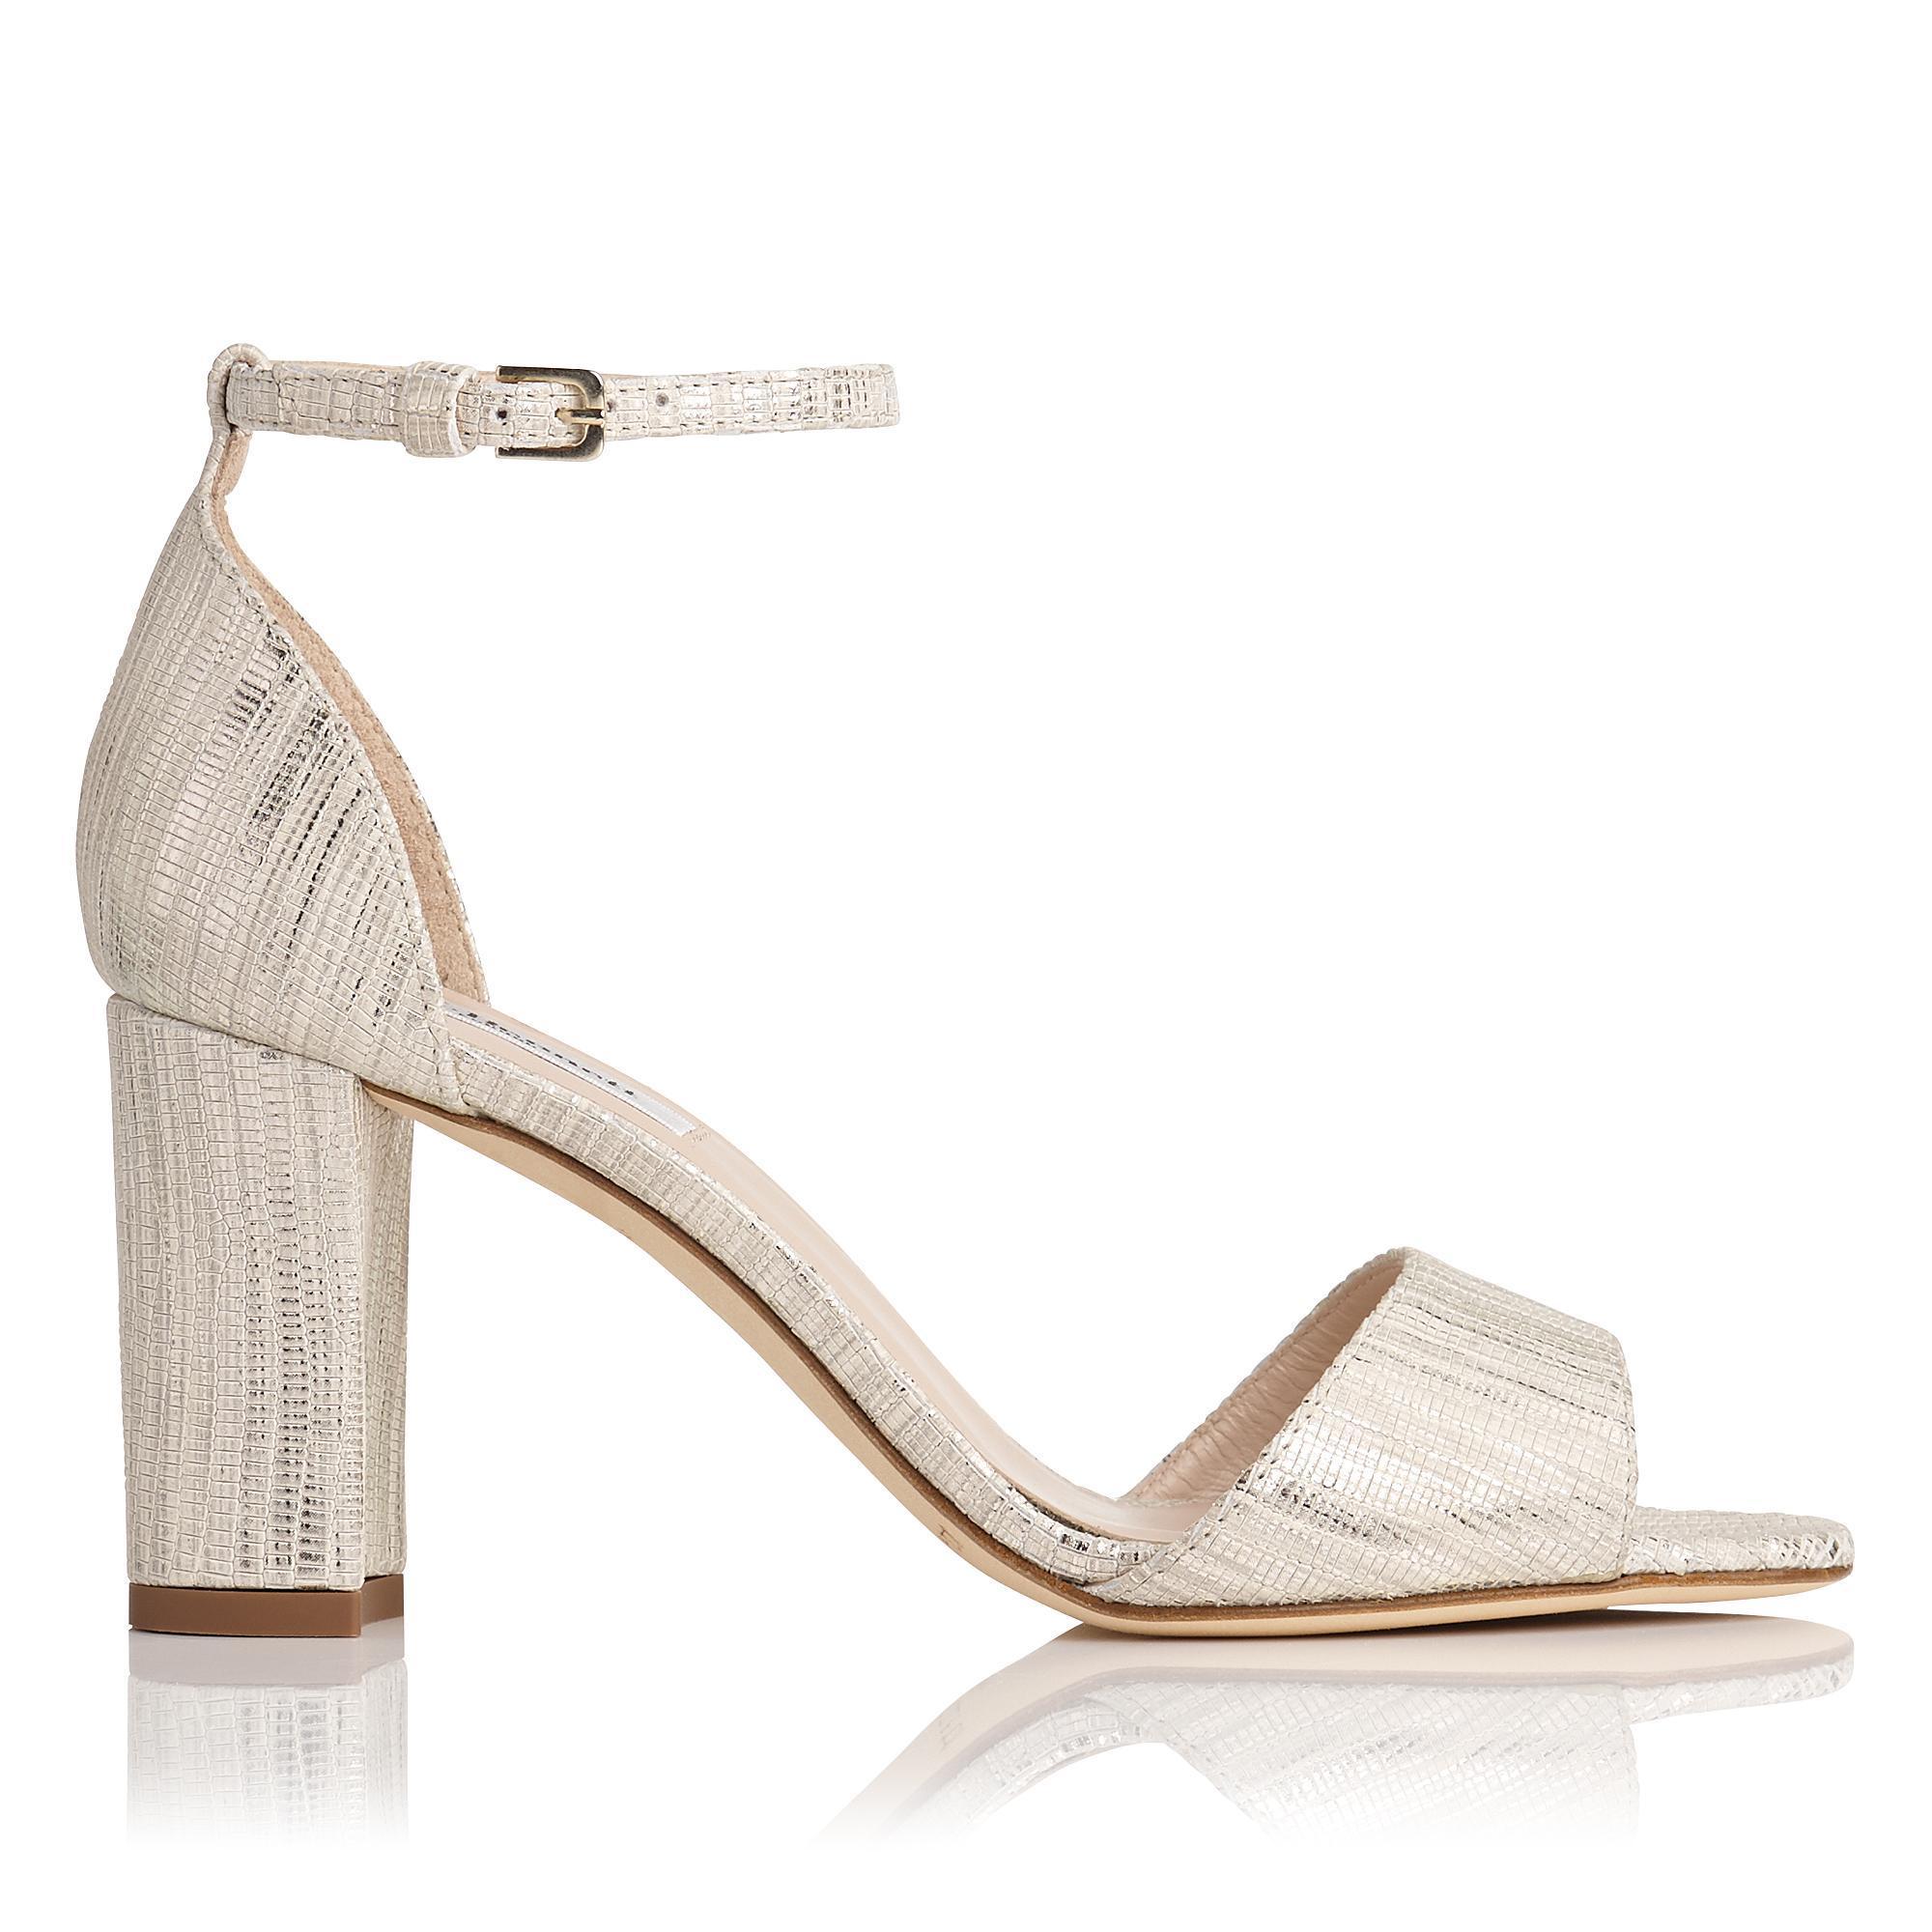 62639c3c16f2 L.K.Bennett Helena Cream Metallic Lizard Formal Sandals in Metallic ...